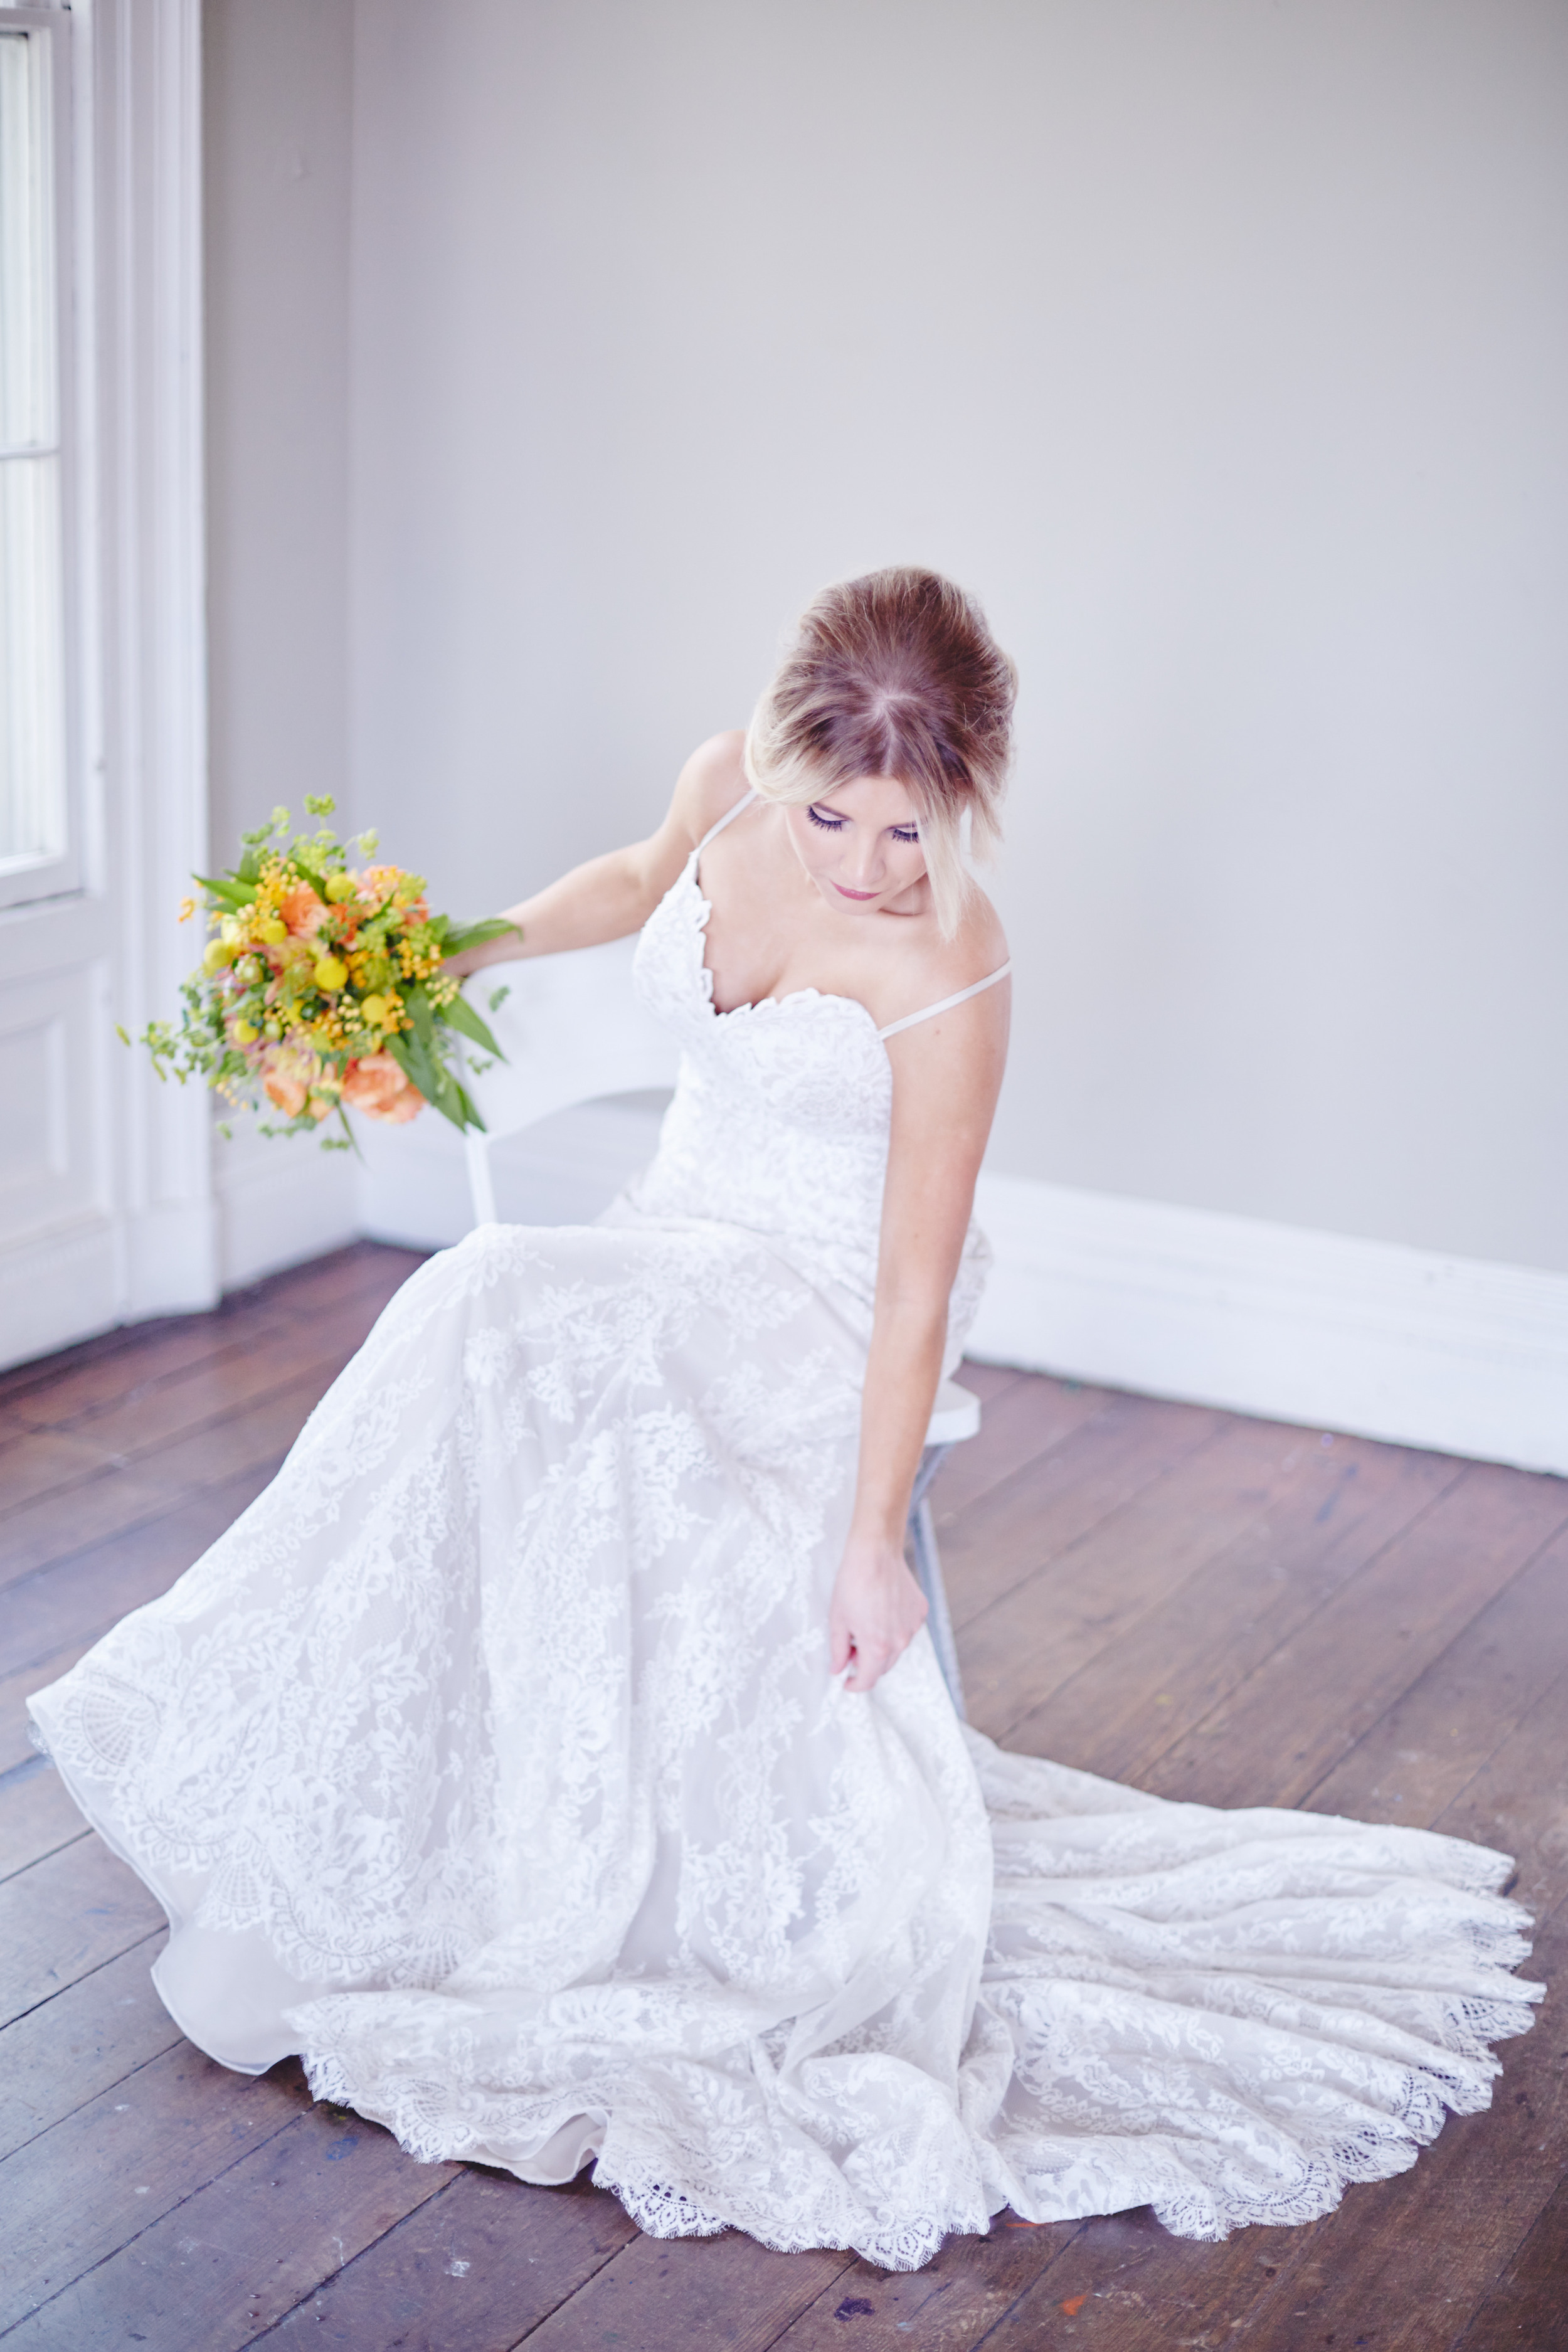 Styled_Session_Becca_Bridal_Portraits_Sarah_Tau_Photography_HOB_Studio_285 65.jpg